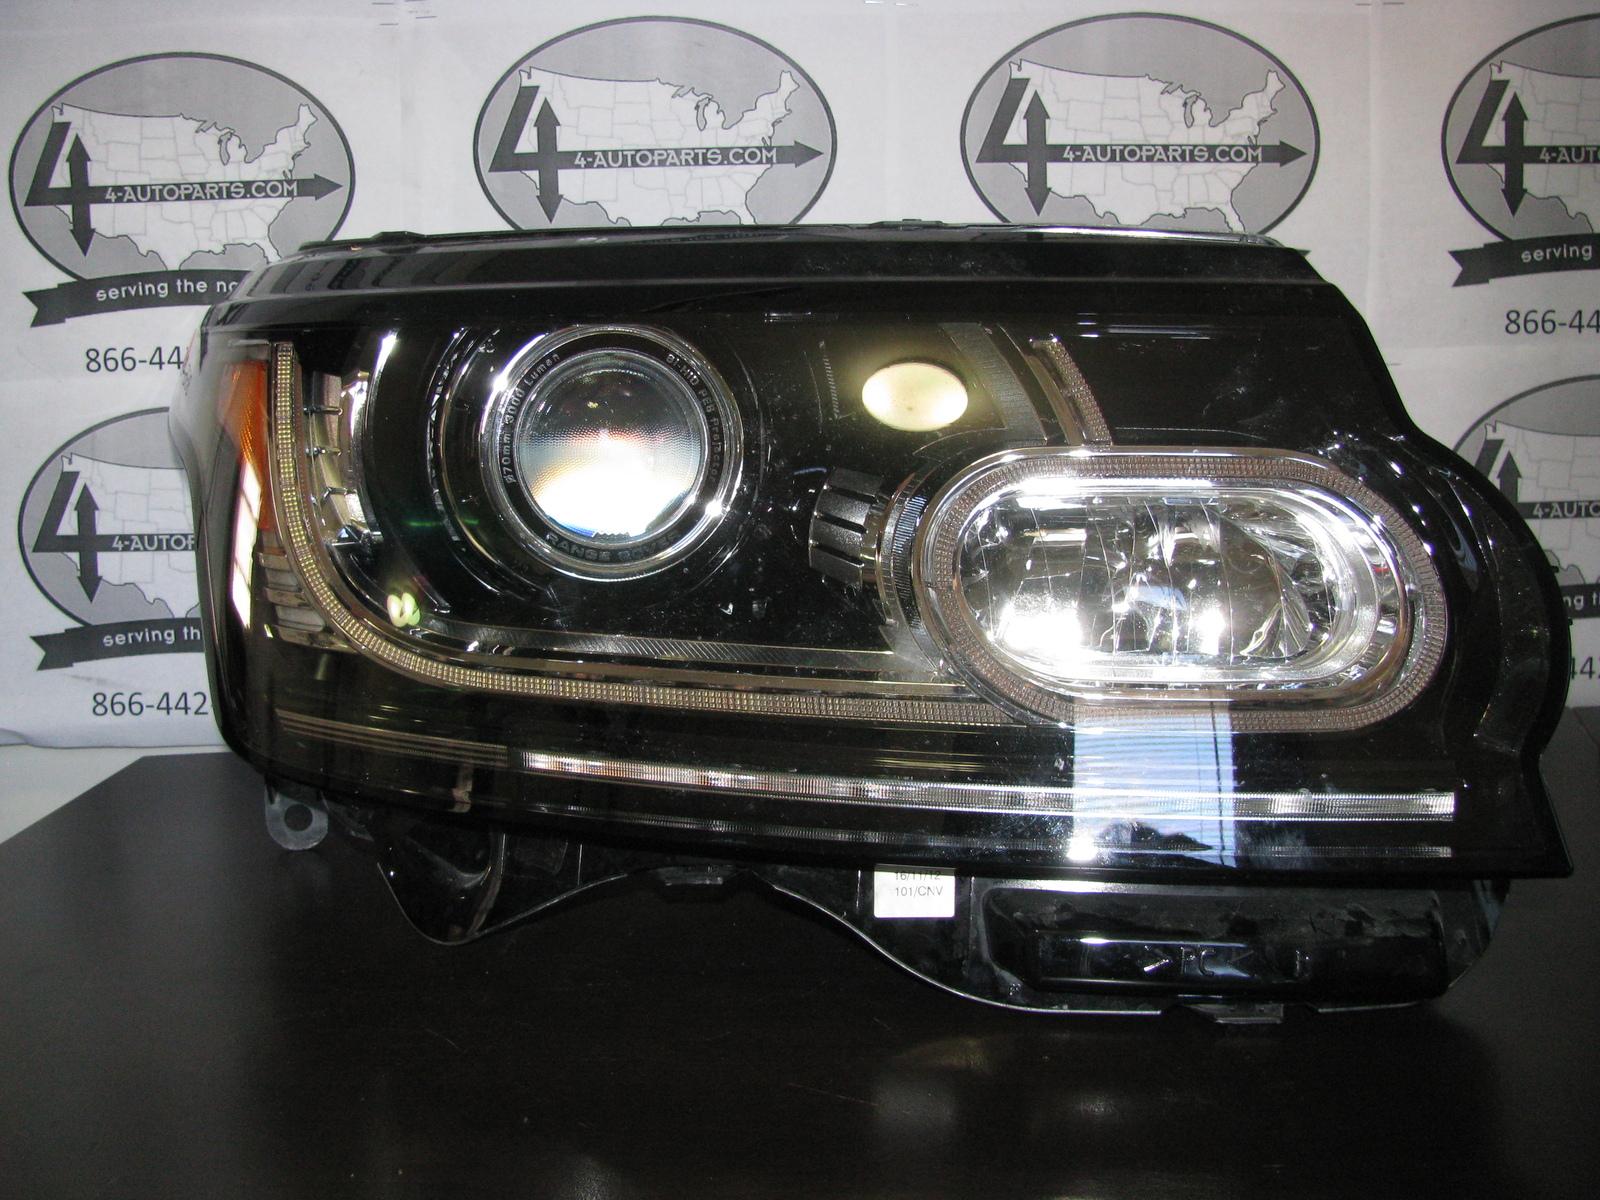 2013 2014 range rover hse right xenon hid headlight w. Black Bedroom Furniture Sets. Home Design Ideas